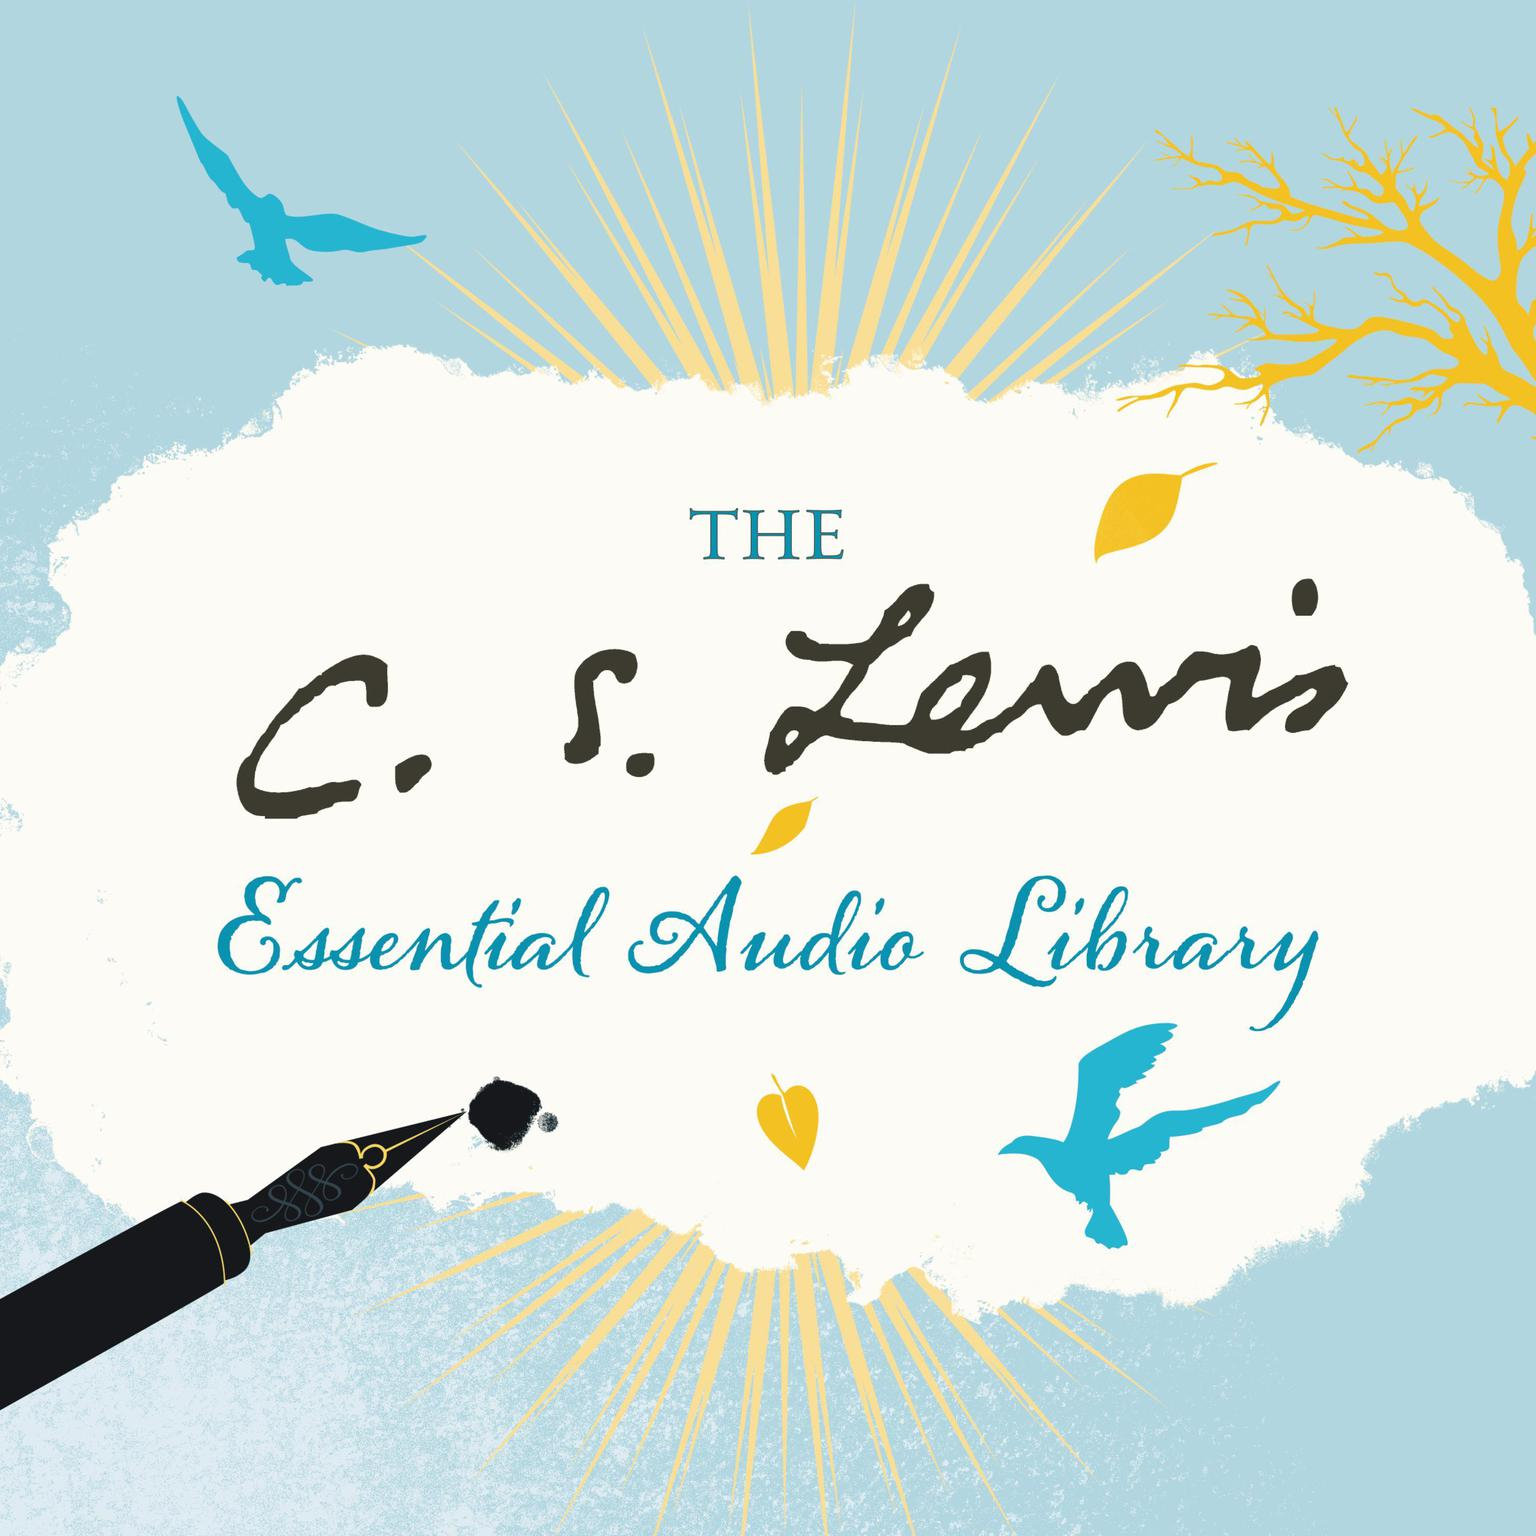 C. S. Lewis Essential Audio Library Audiobook, by C. S. Lewis